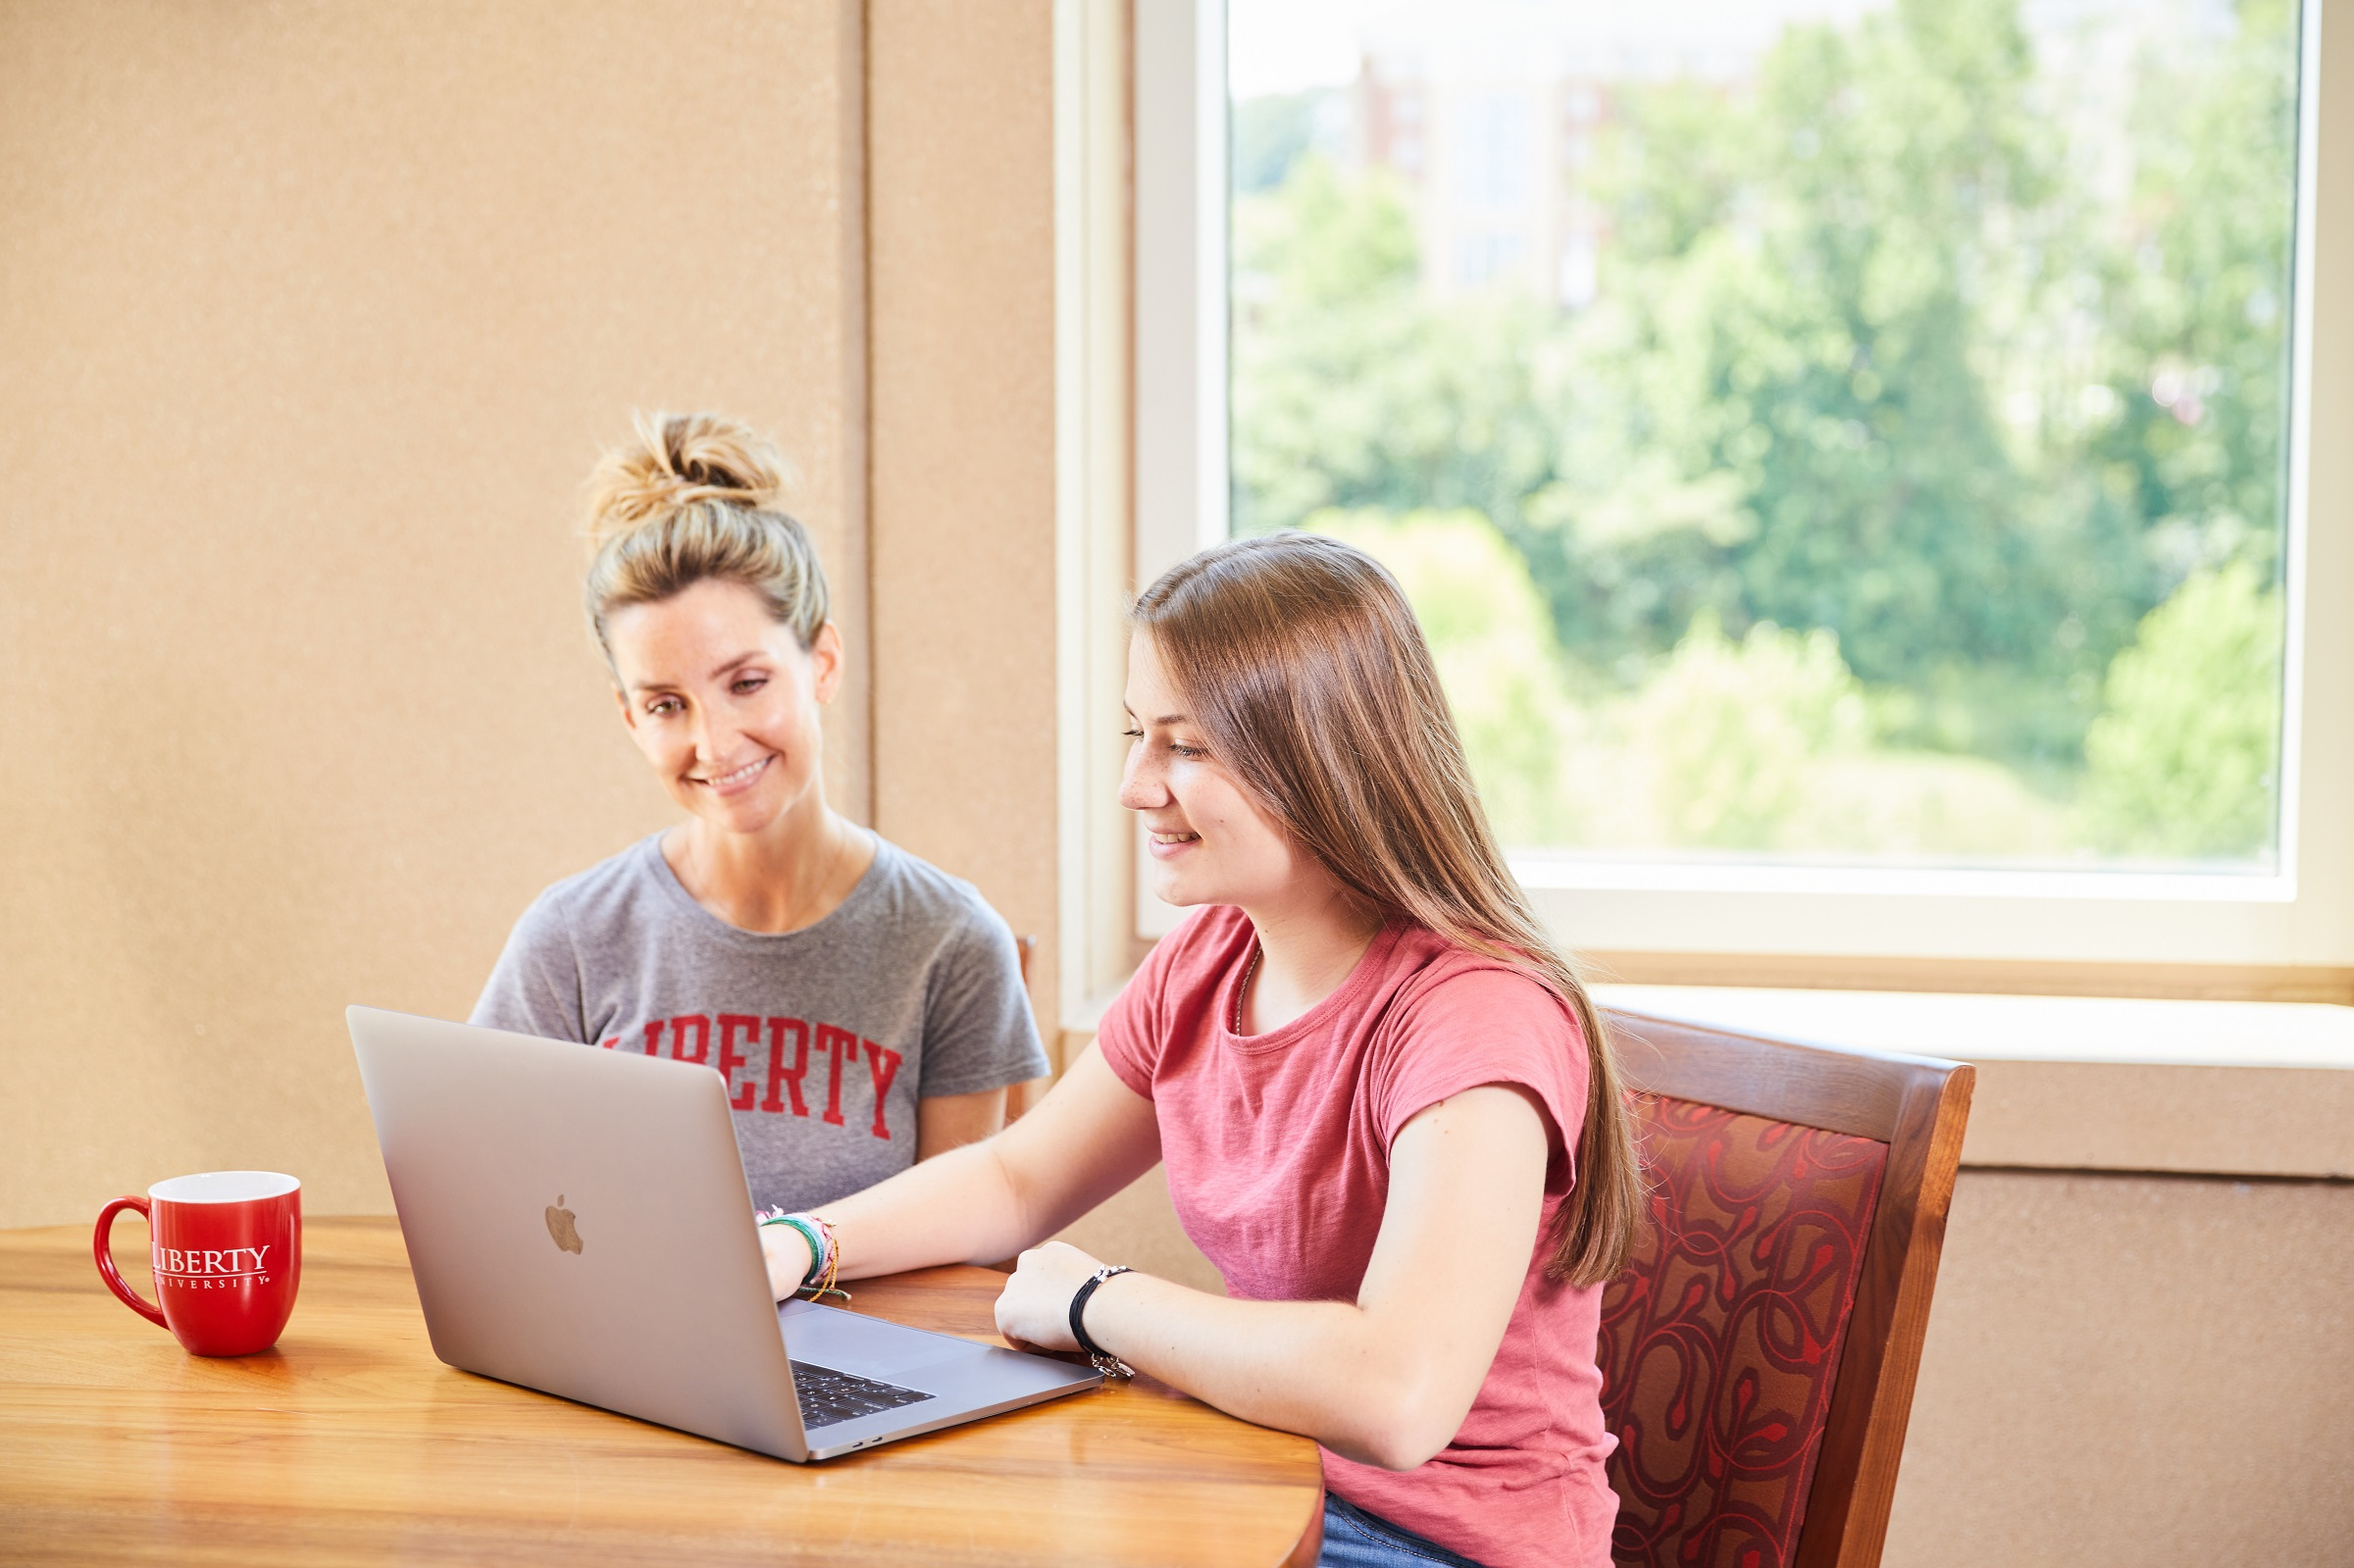 Liberty University Contact